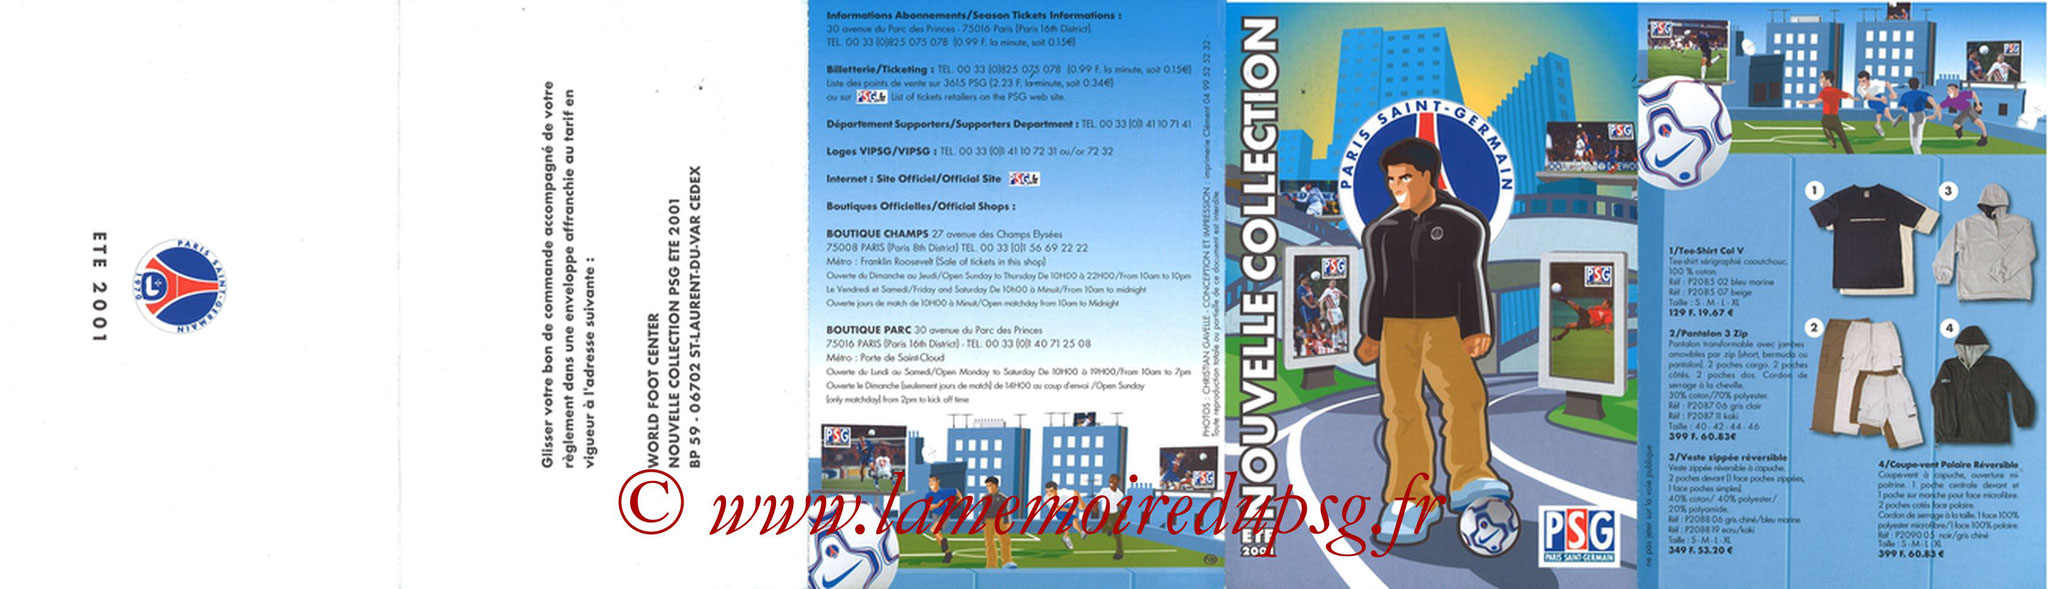 Catalogue PSG - 2001-02b - Recto